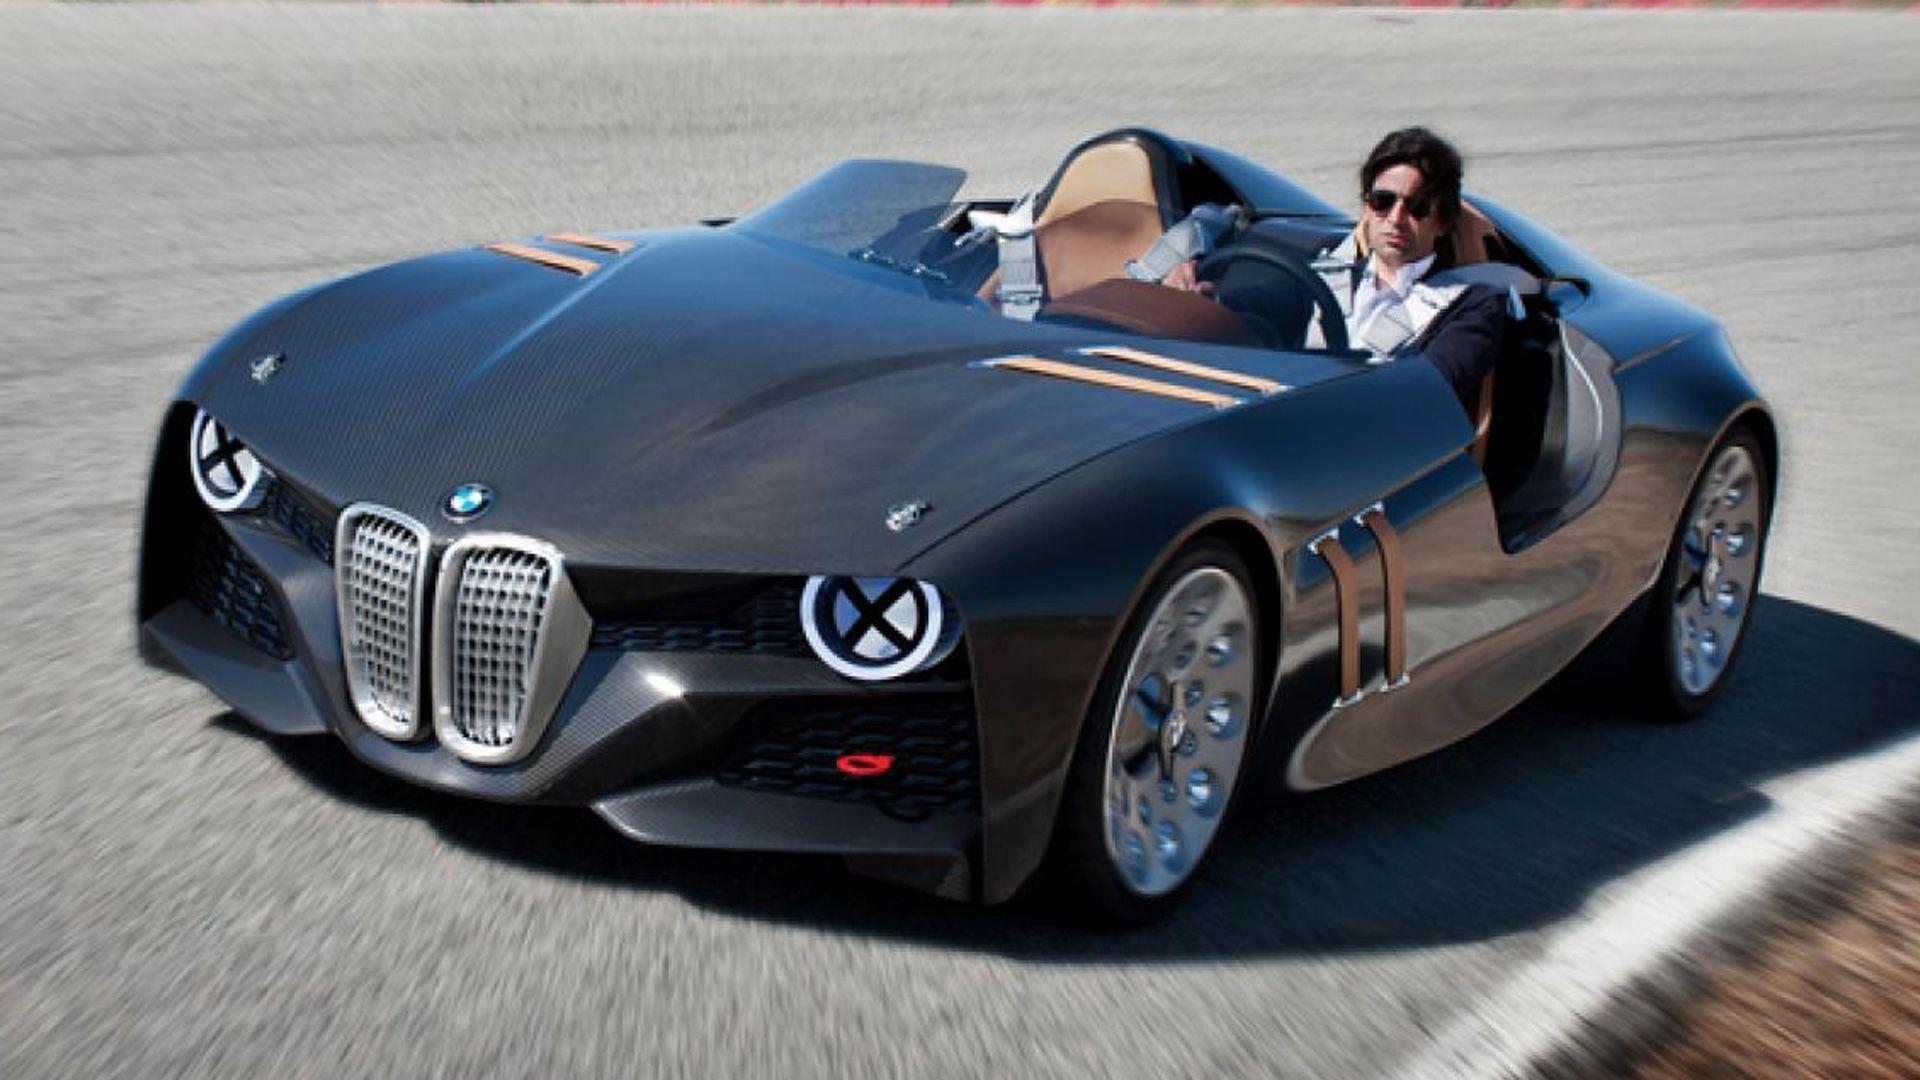 Bmw 328 Hommage Concept Bmw 328 Bmw Automotive Design